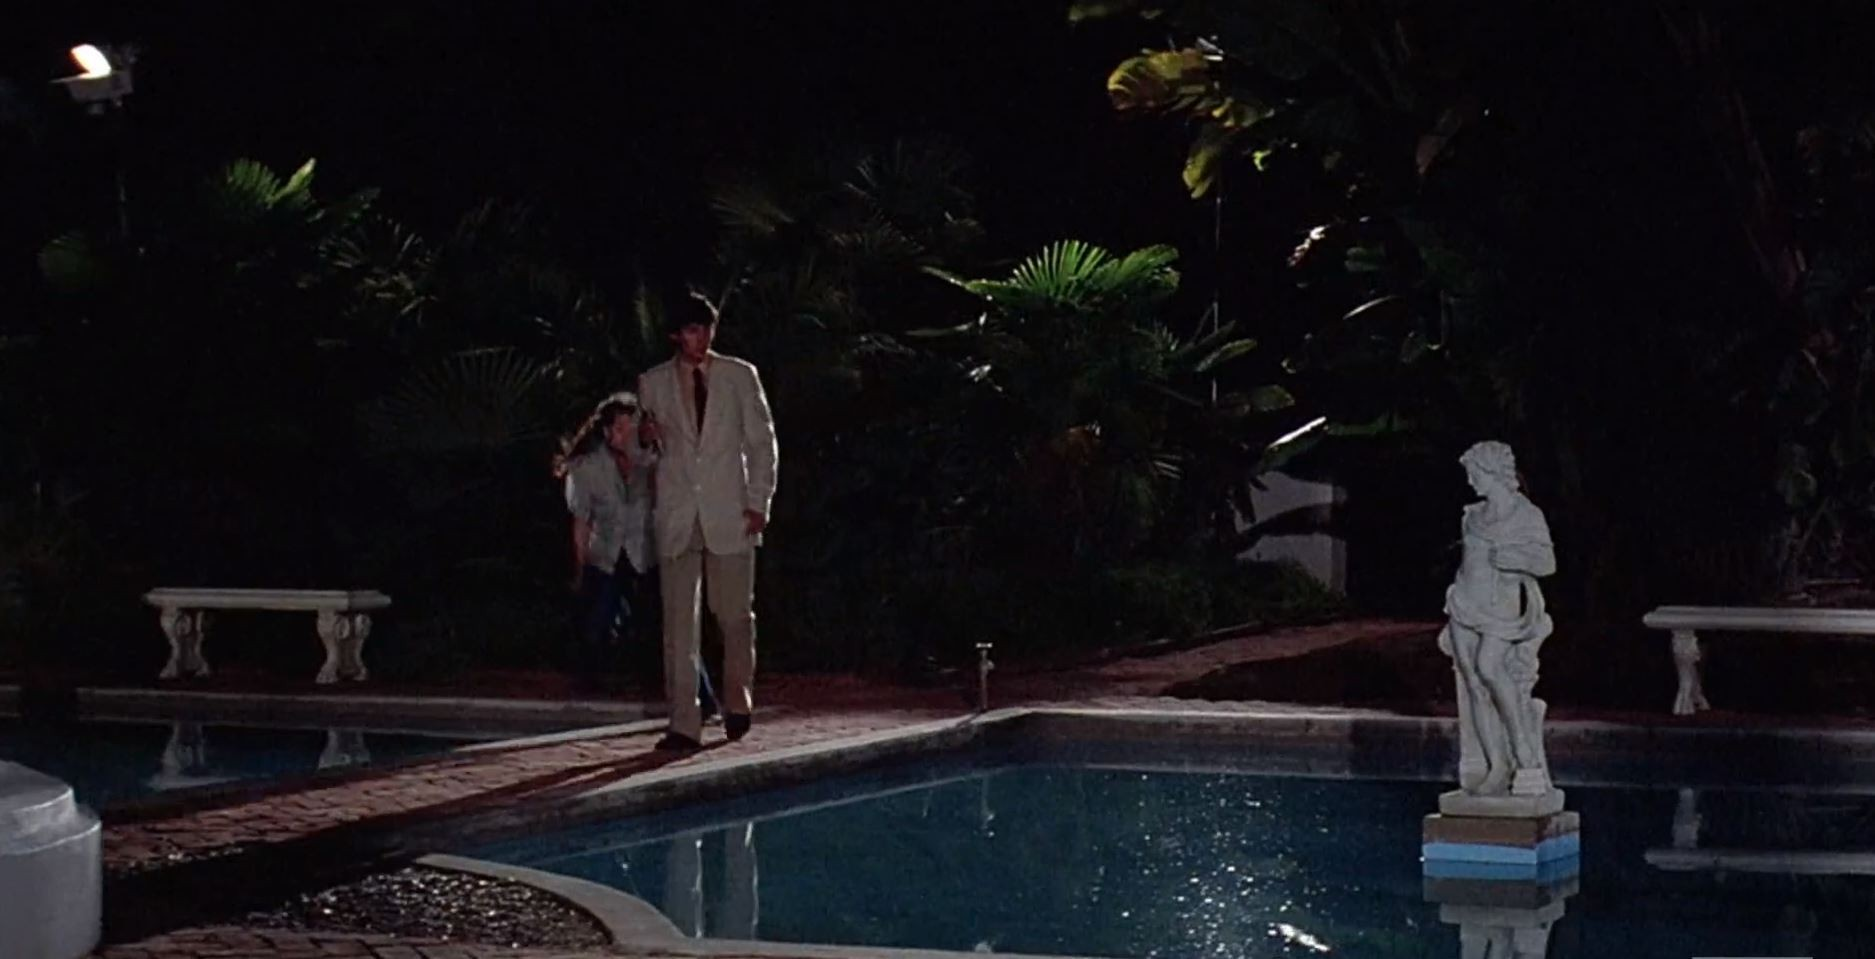 Ending scene of Scarface